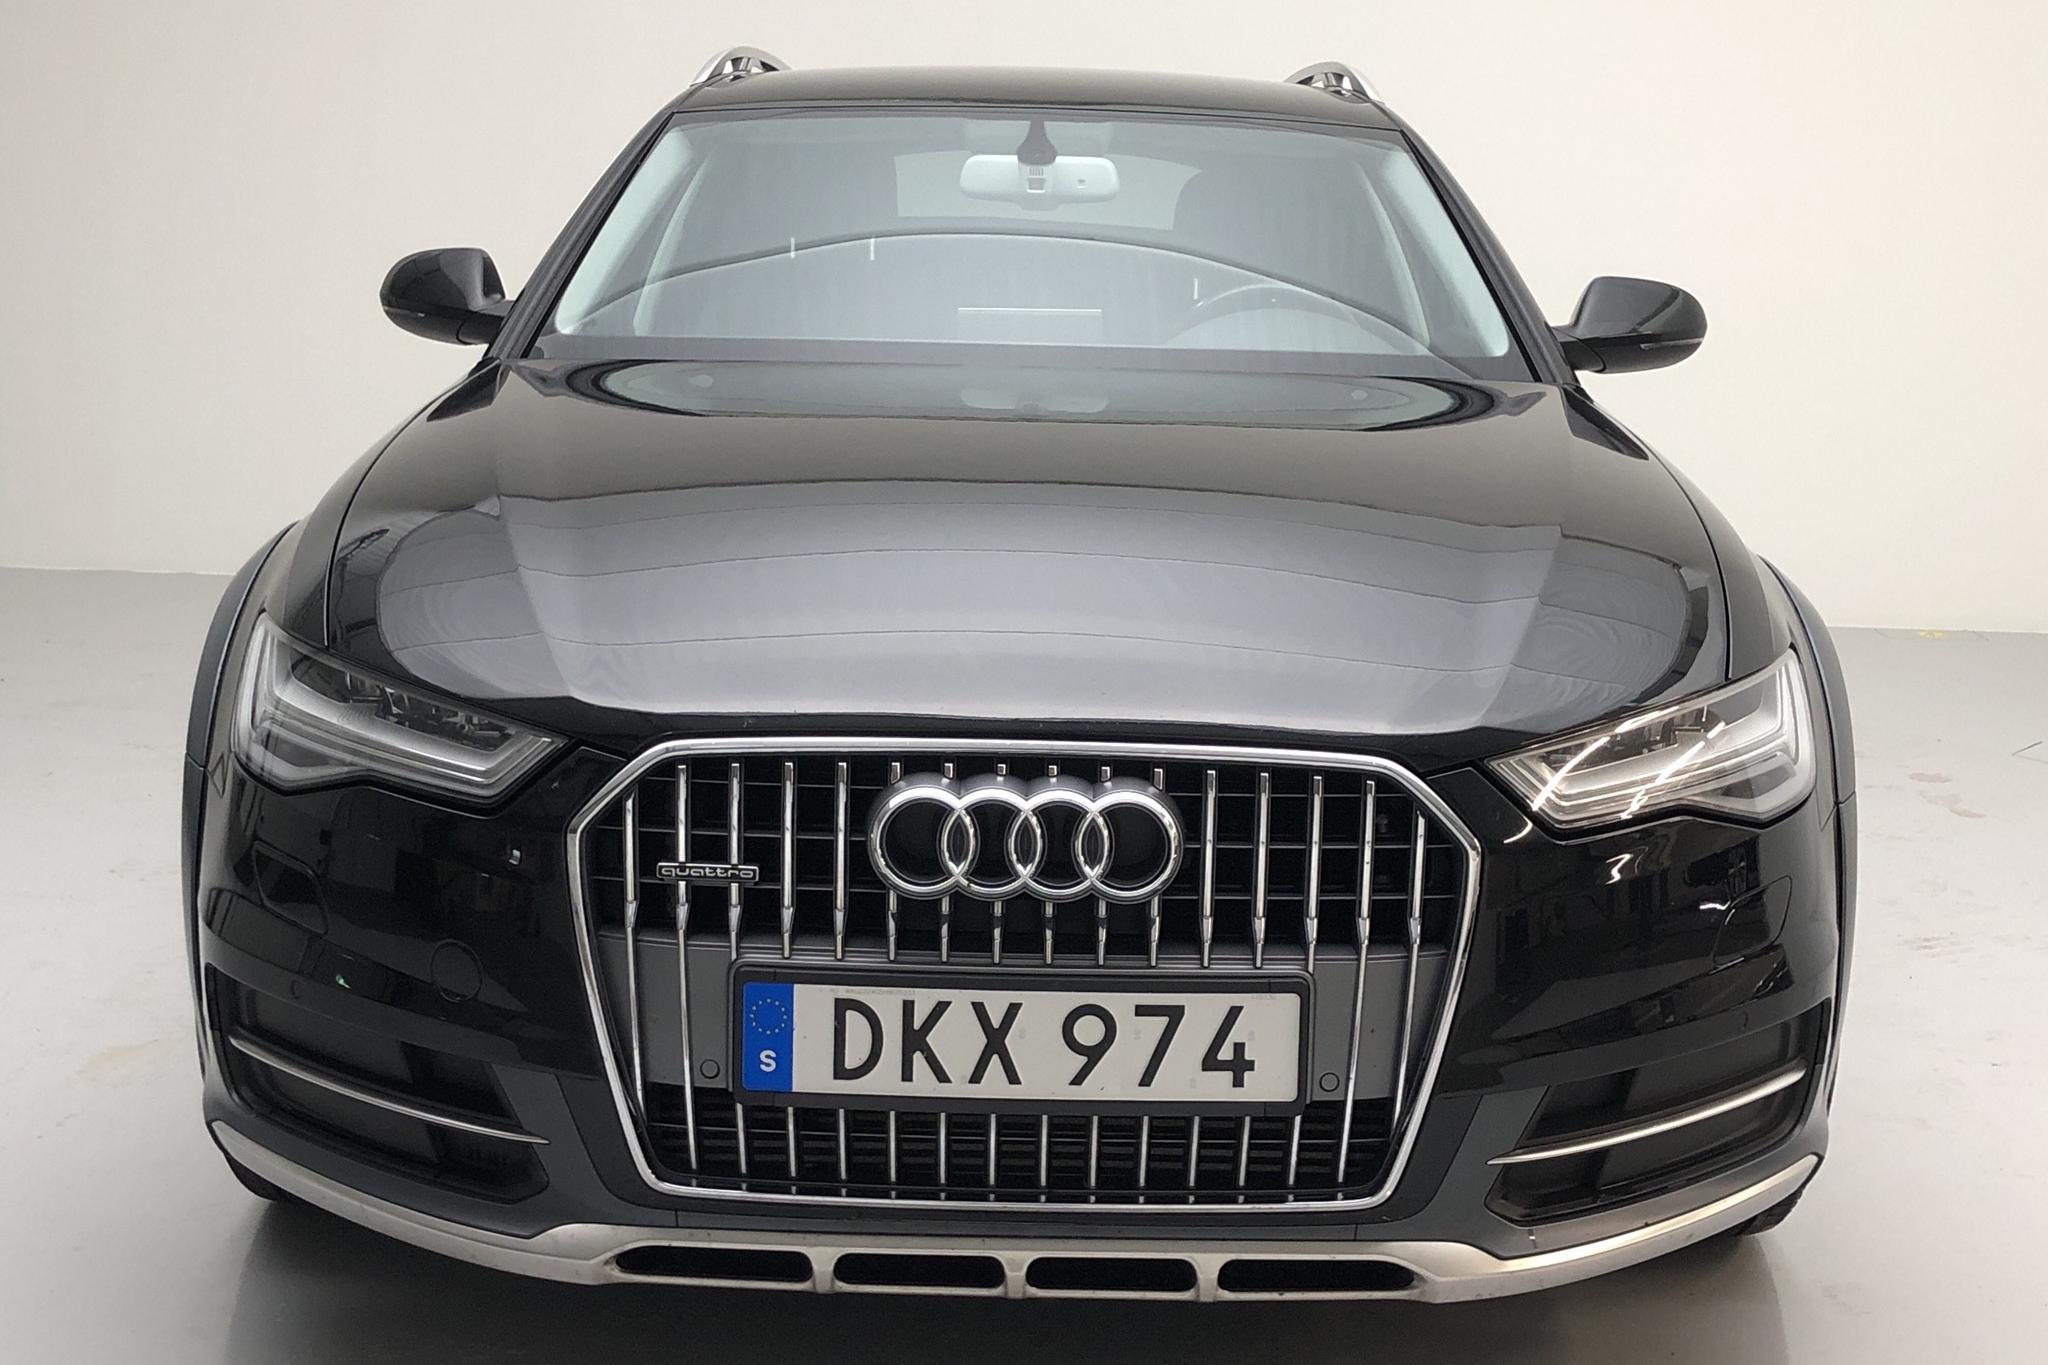 Audi A6 Allroad 3.0 TDI quattro (218hk) - 52 000 km - Automatic - black - 2017